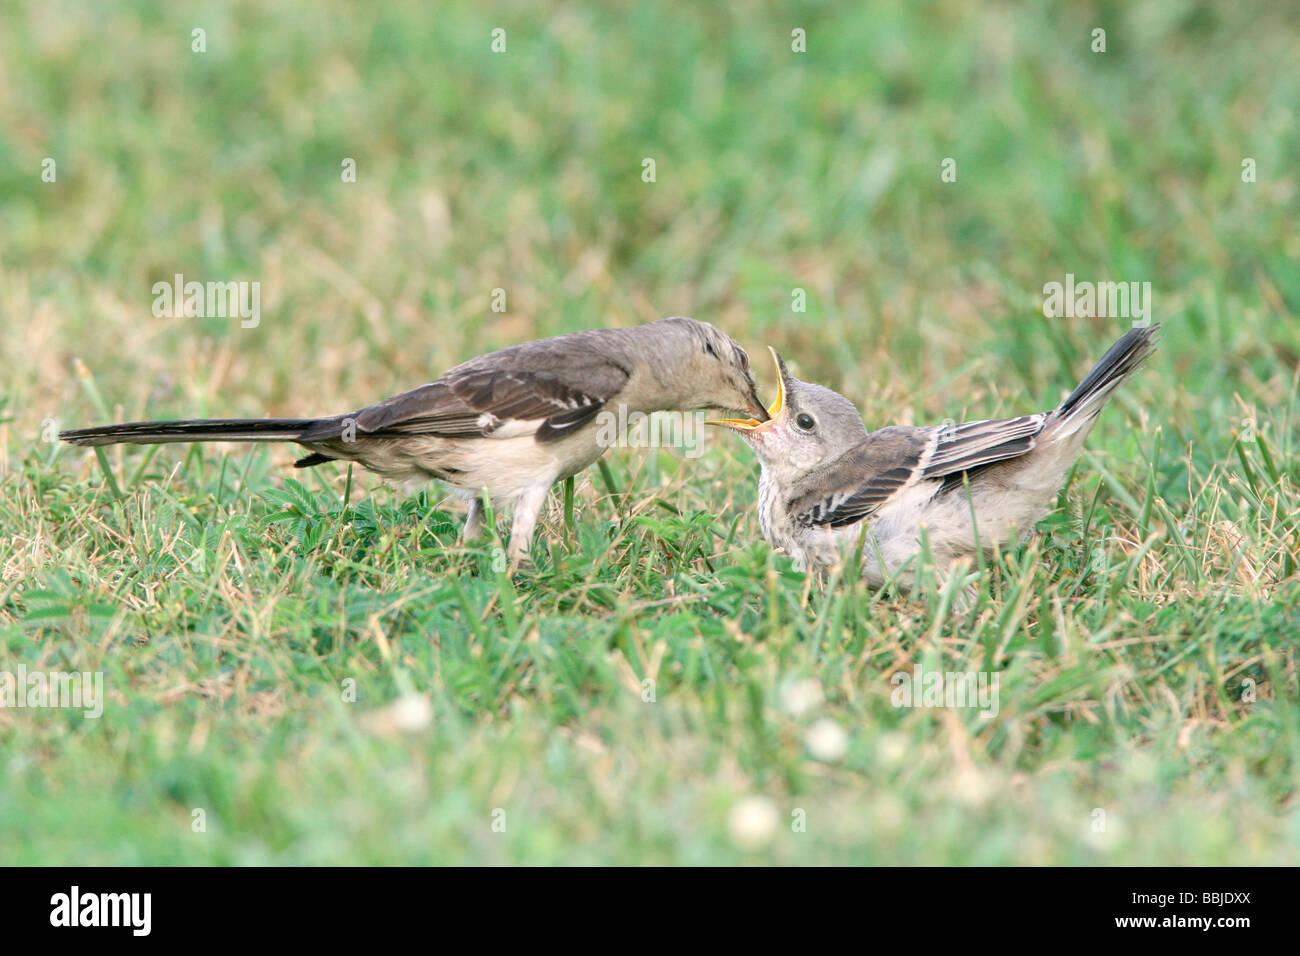 Northern Mockingbird feeding Fledgling Stock Photo